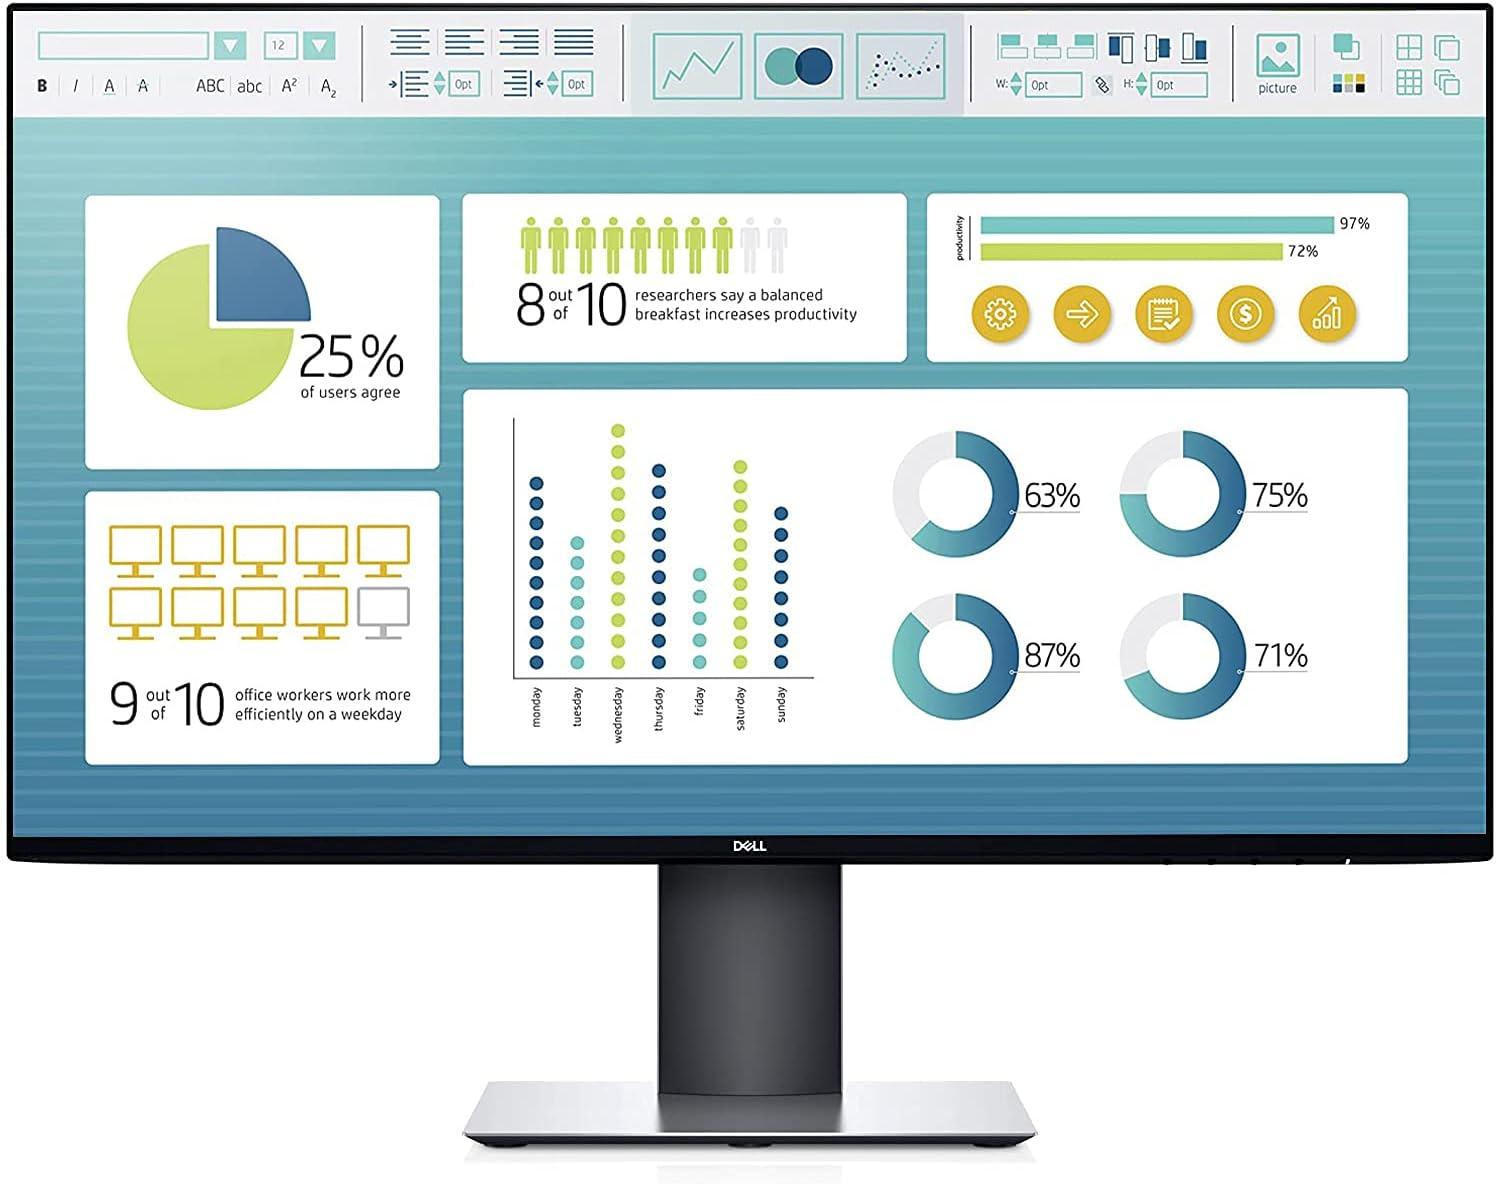 Dell Ultrasharp 27-Inch WQHD 2560x1440 Resolution IPS Monitor with Infinity Edge Bezels, HDMI, DisplayPort, USB 3.0, Black